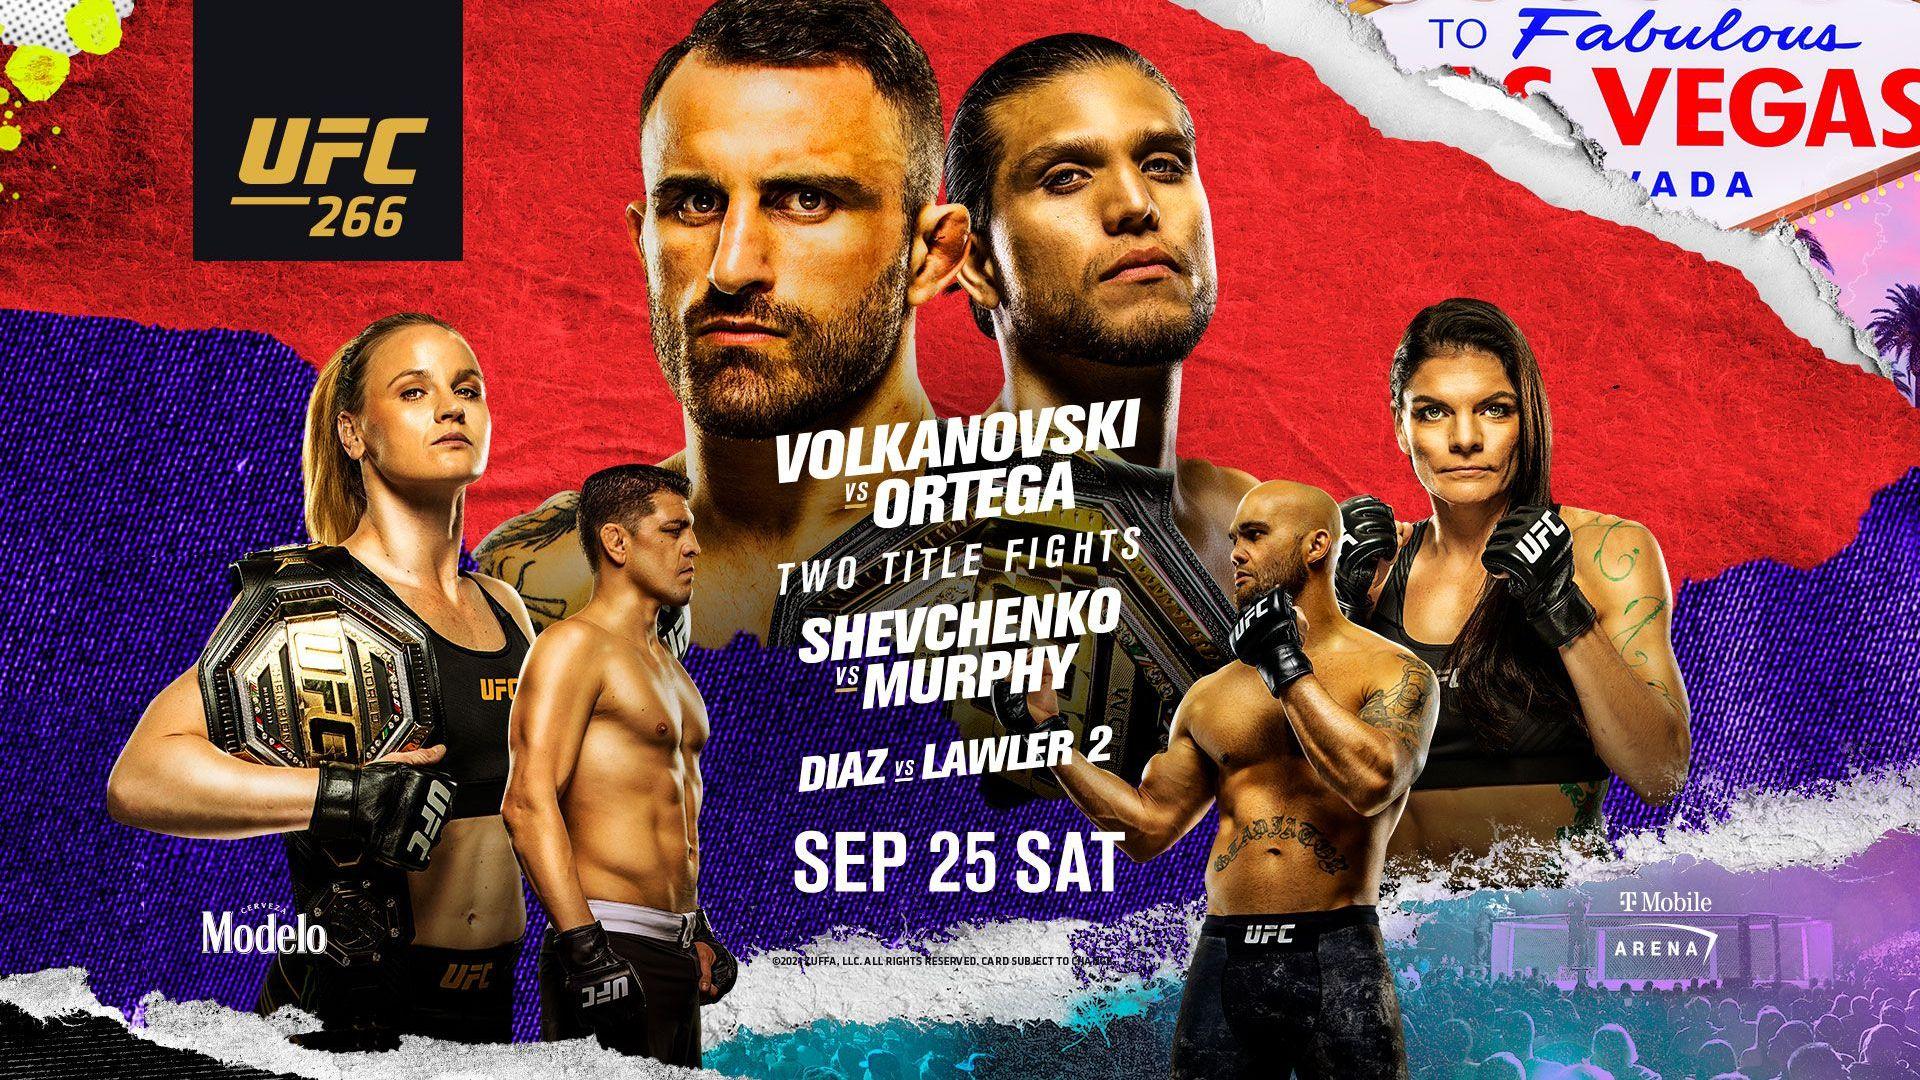 UFC 266: Volkanovski vs Ortega - Reddit MMA Streams Live, How to Watch Online, Time, Fight Card